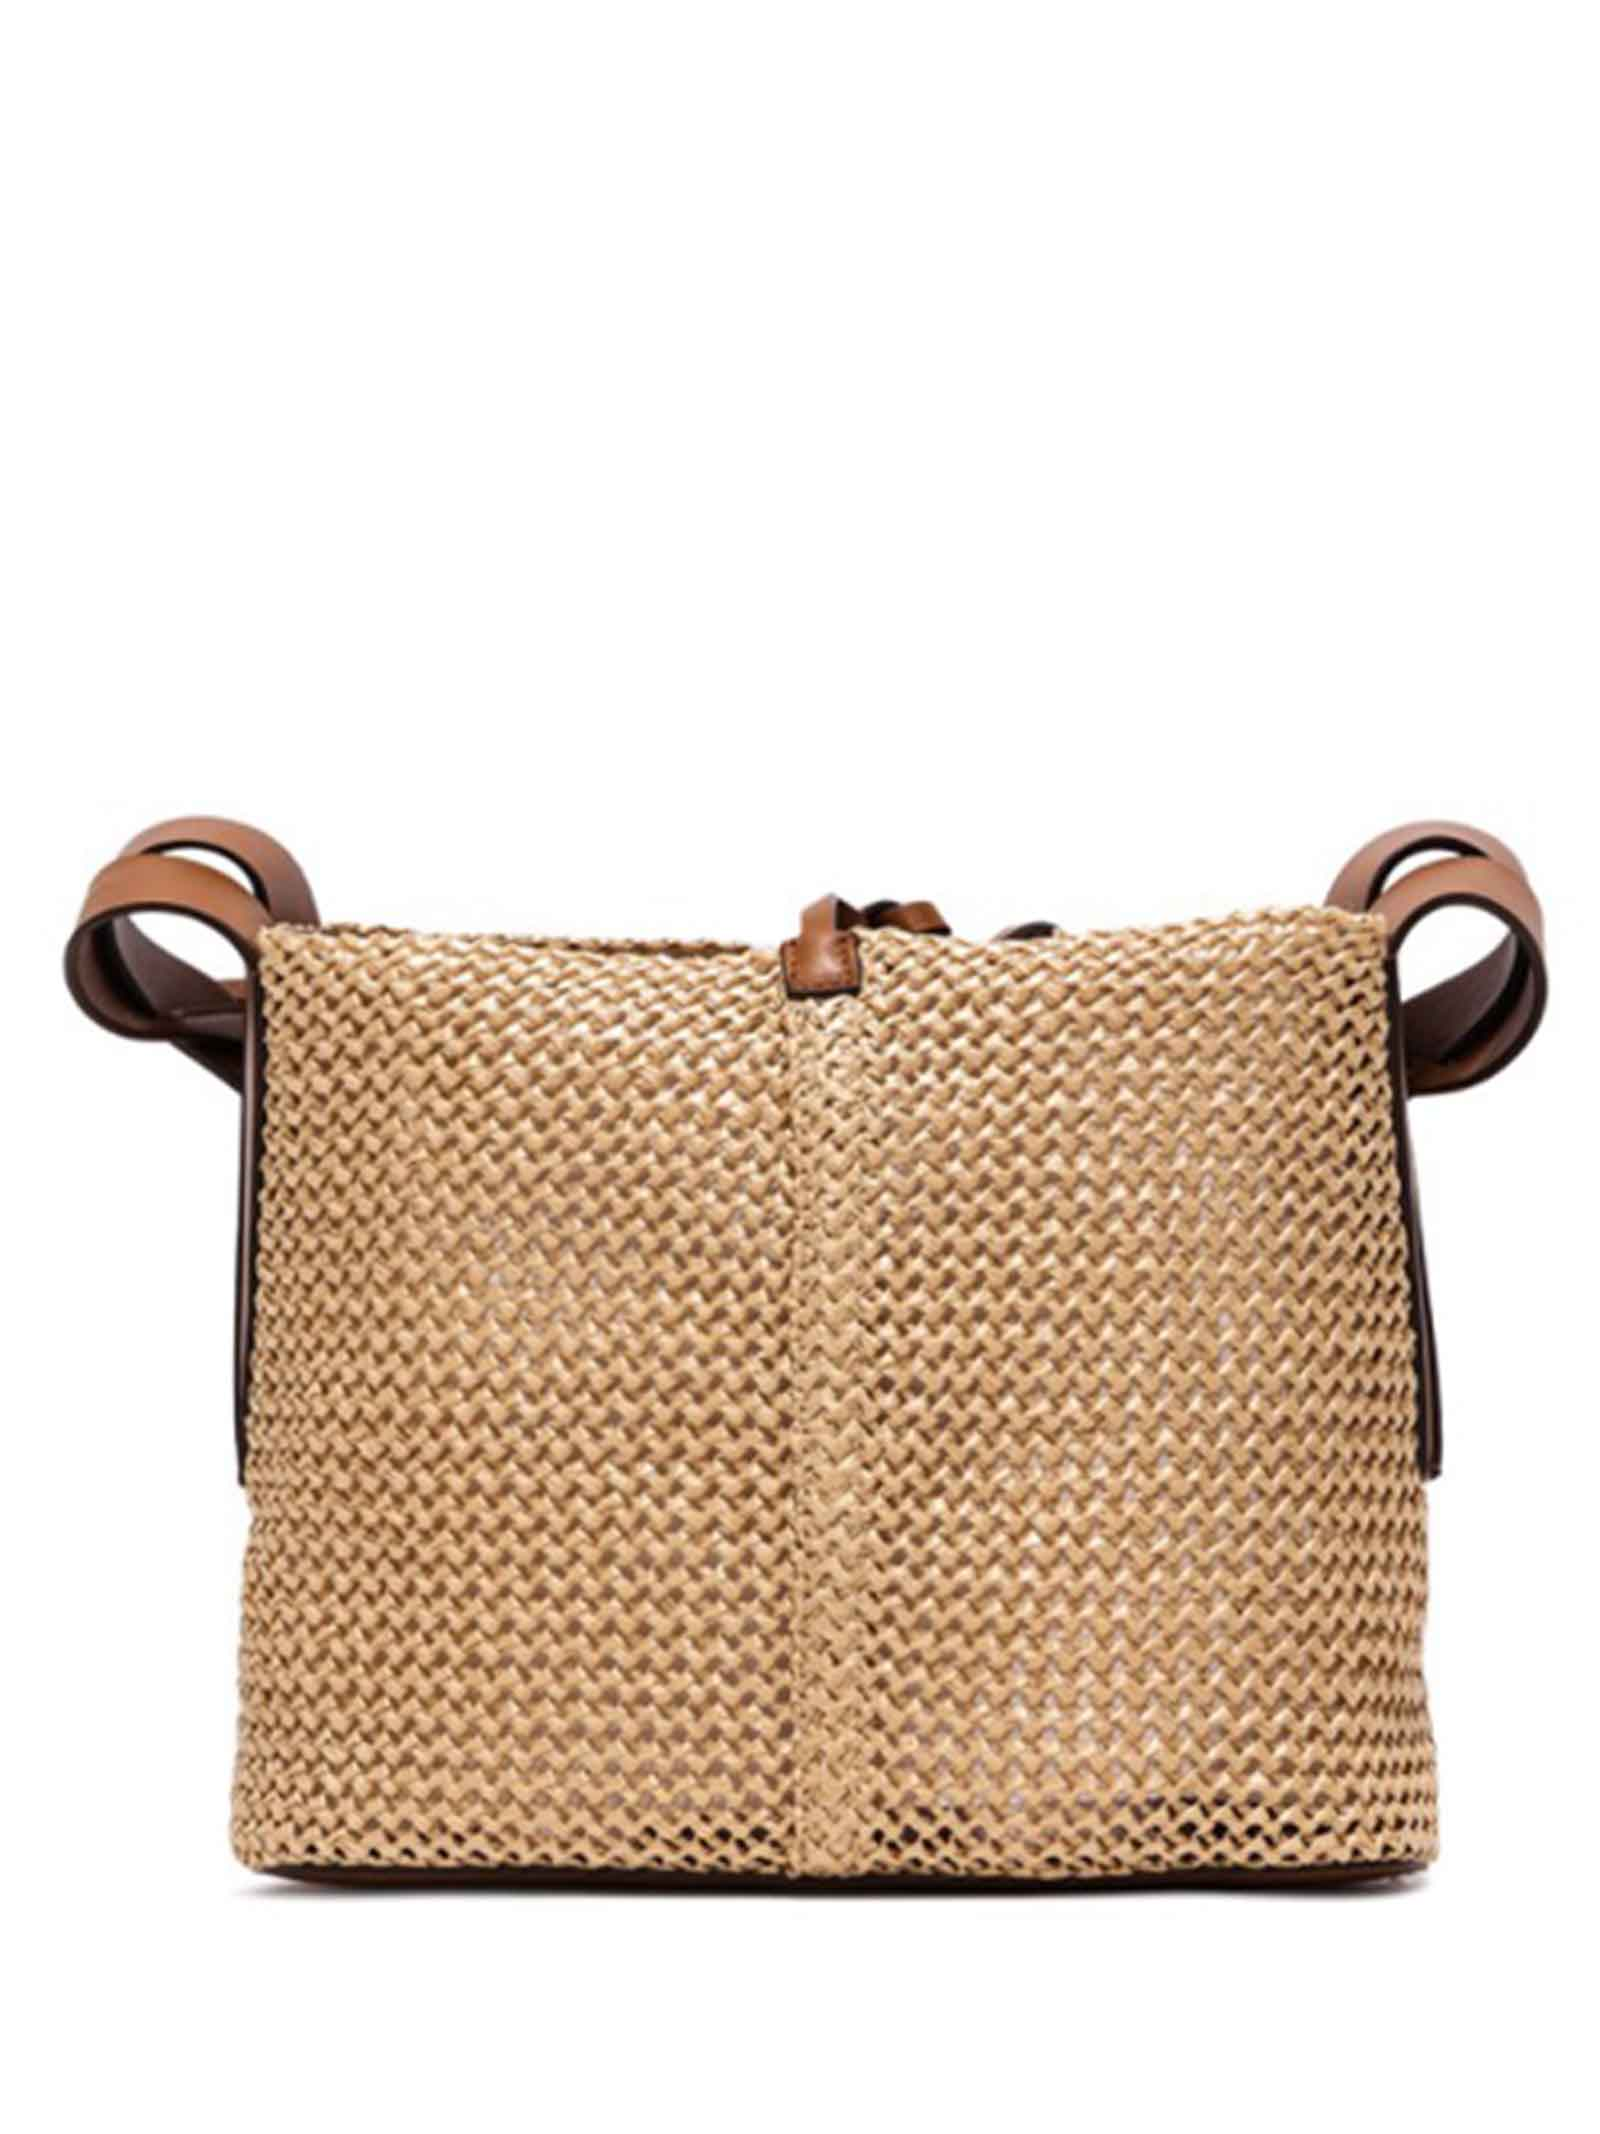 Gianni Chiarini   Bags and backpacks   BS86902515